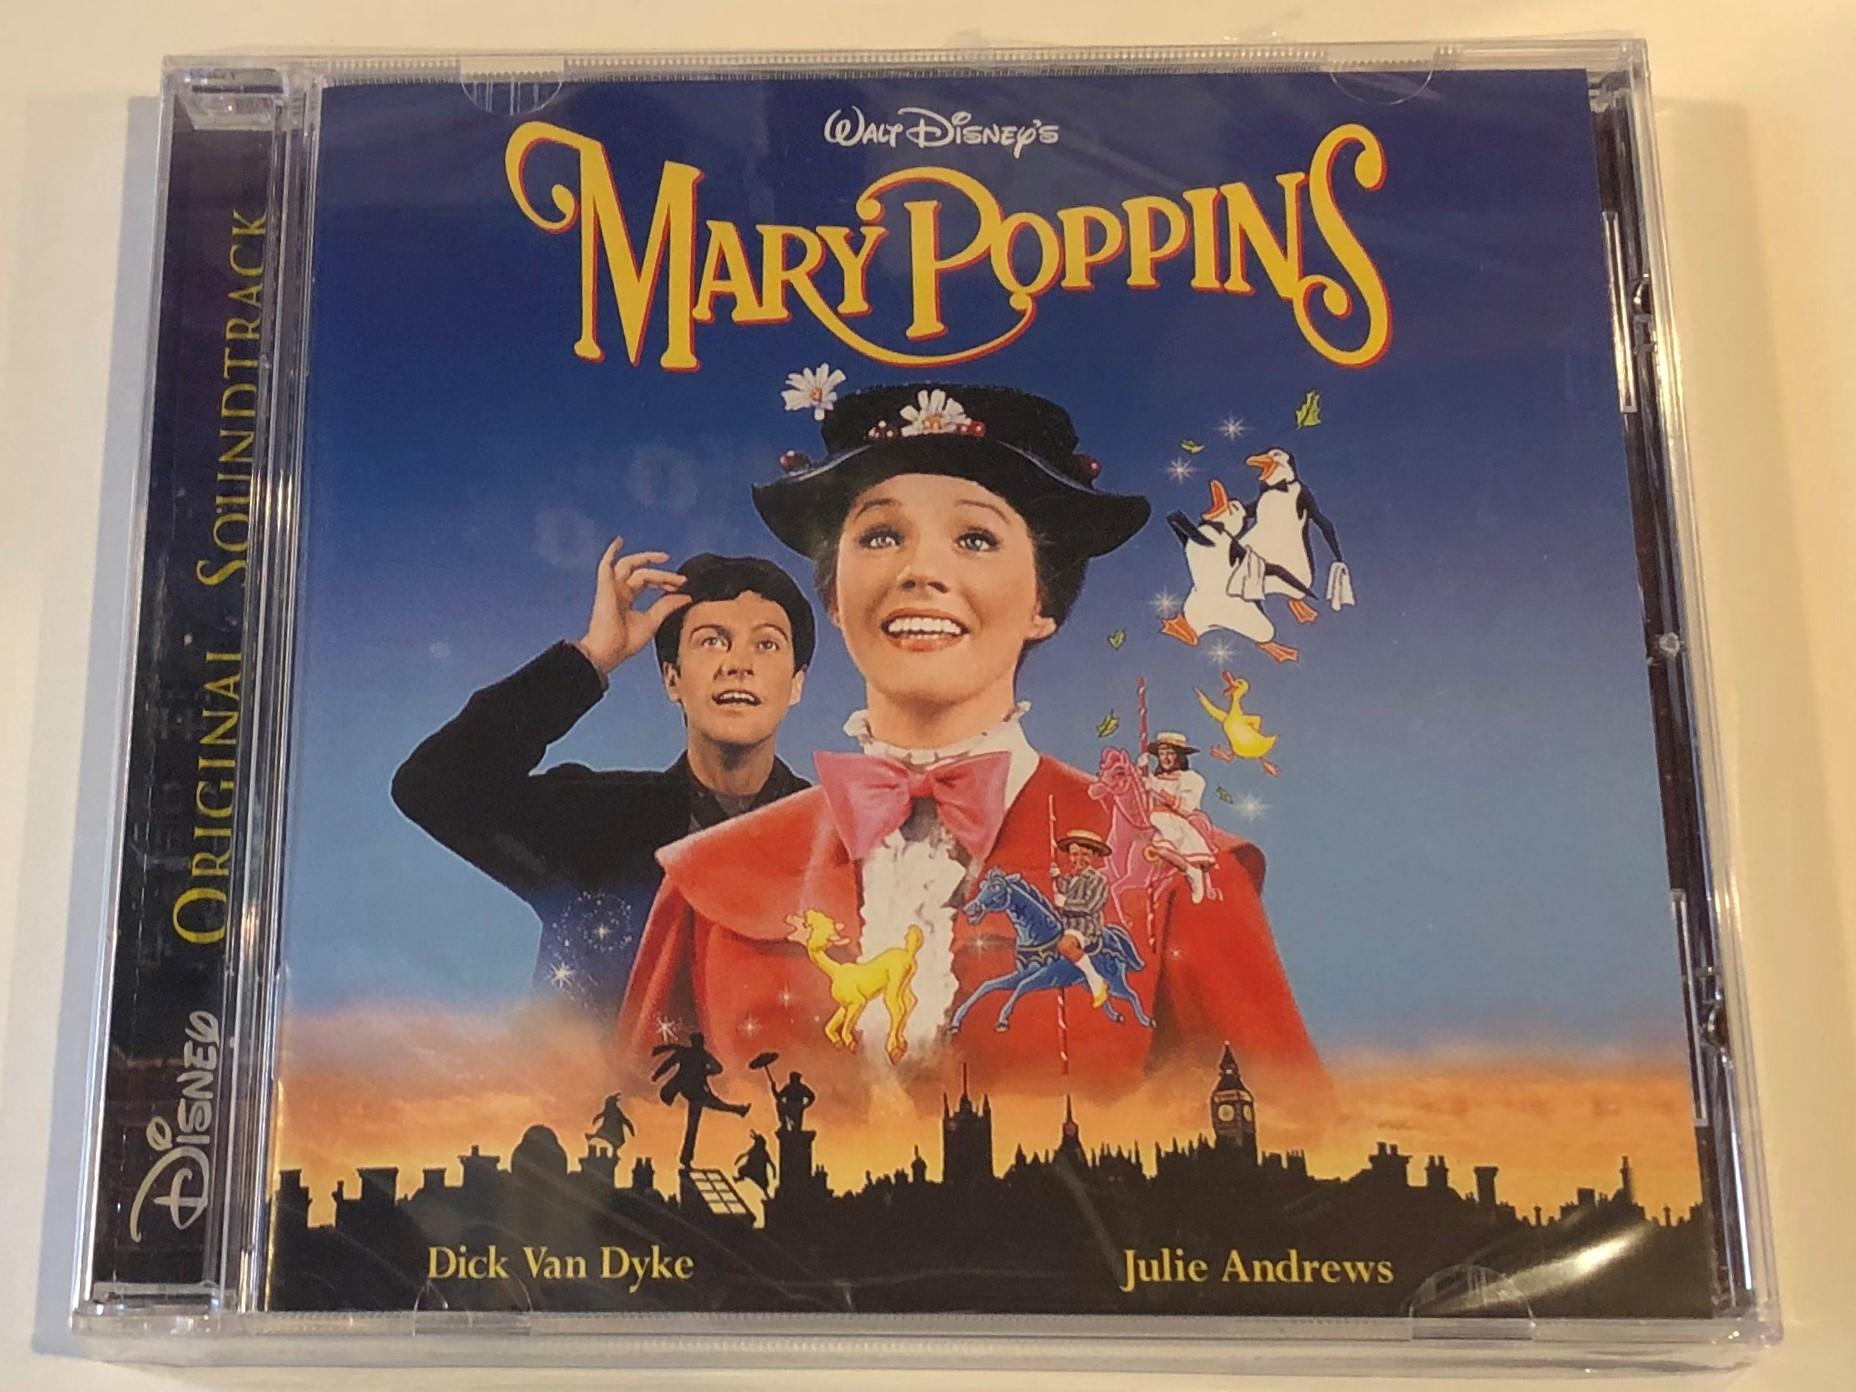 walt-disney-s-mary-poppins-dick-van-dyke-julie-andrews-original-soundtrack-walt-disney-records-audio-cd-0946-3-51028-2-6-1-.jpg